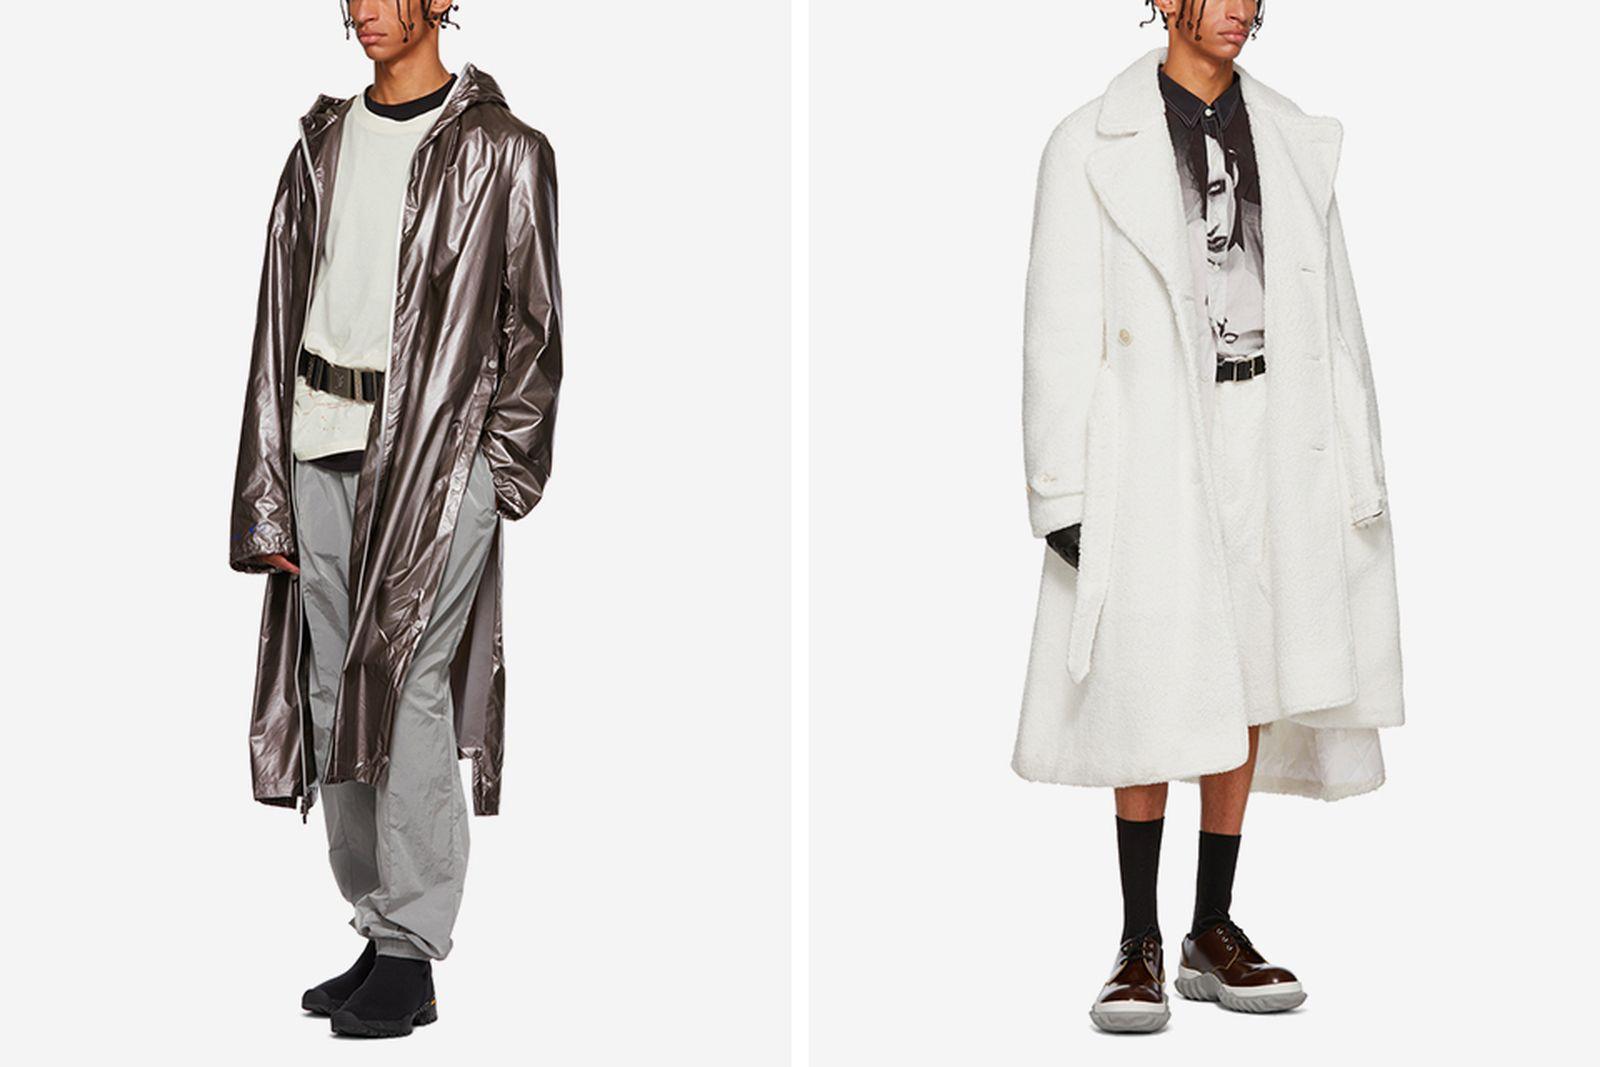 luxury jackets main Acne Studios Colmar A.G.E. Maison Margiela